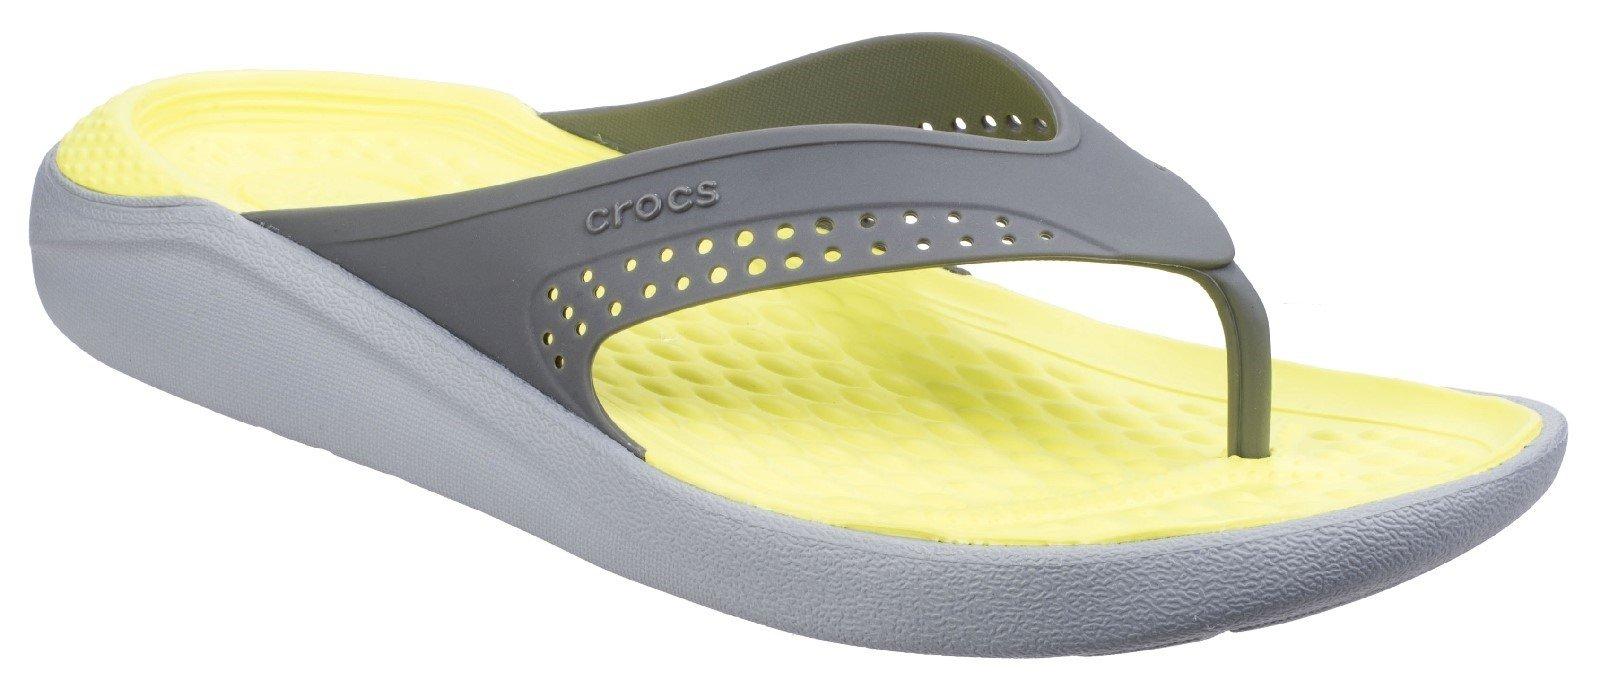 Crocs Unisex LiteRide Flip Flop Various Colours 26904 - Slate Grey/Light Grey 6